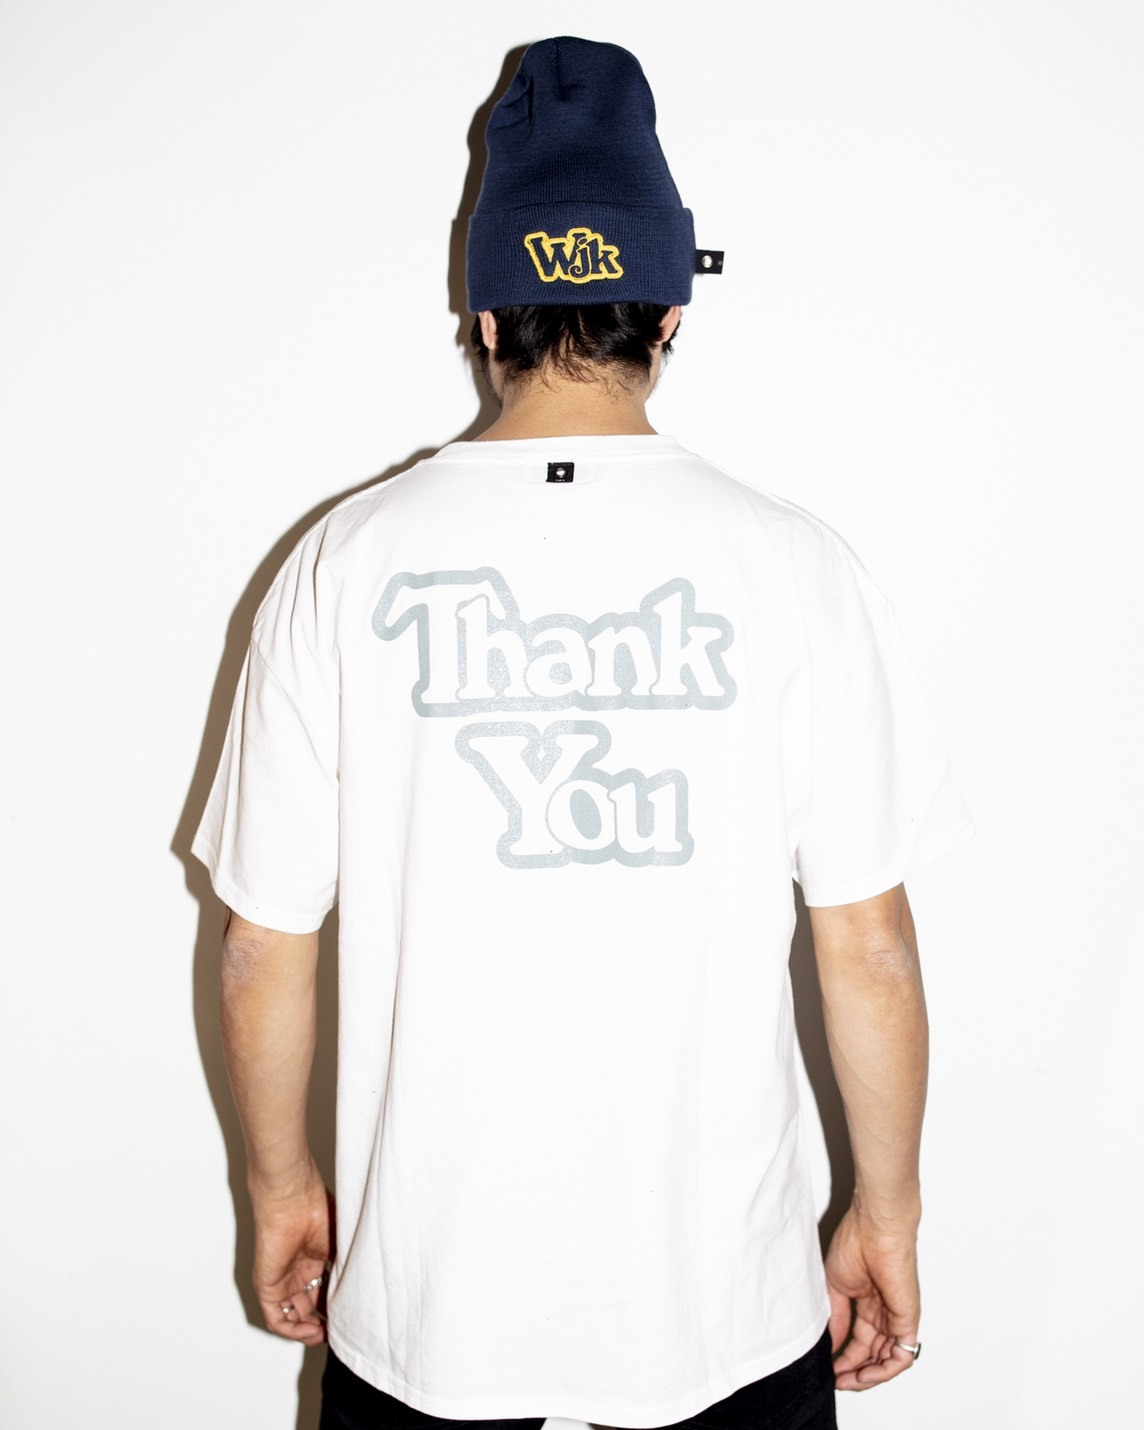 M×wjk コラボレーションTシャツ_e0036919_14114925.jpg